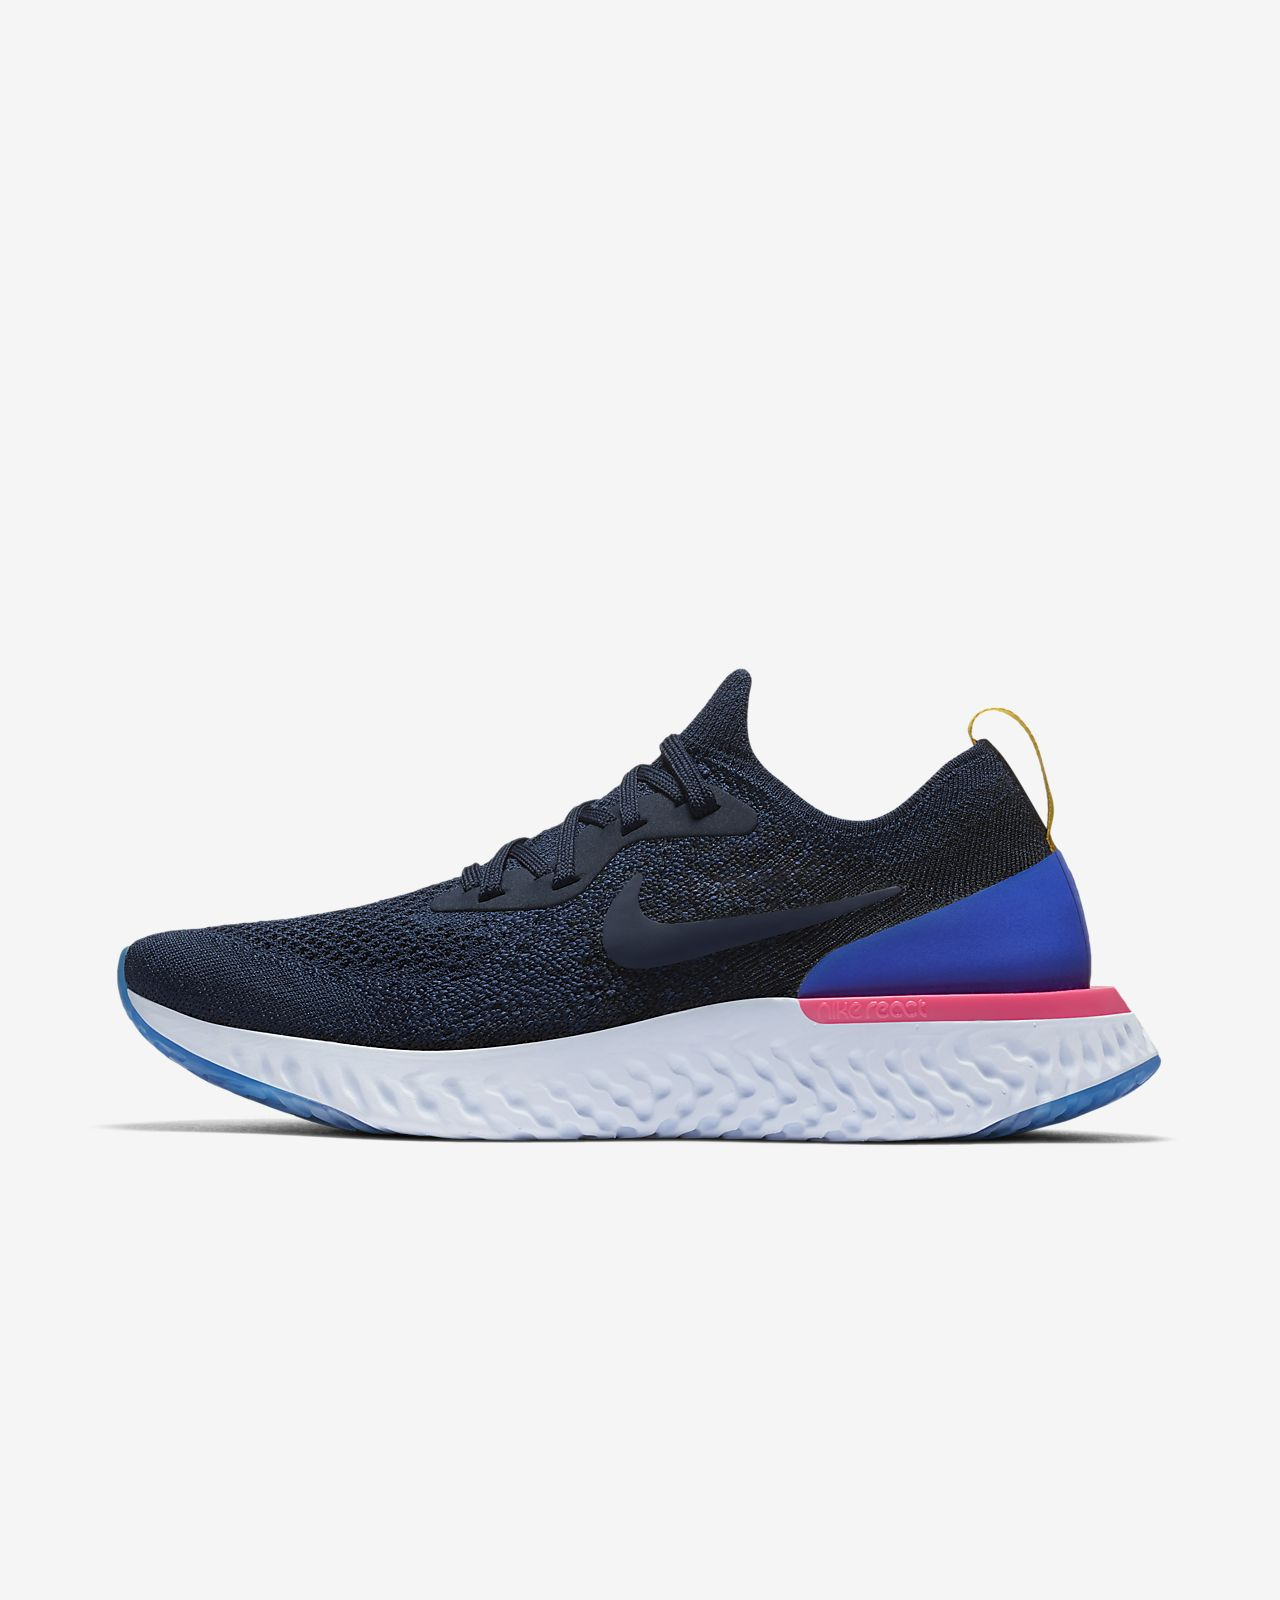 Chaussure de running Nike Epic React Flyknit pour Femme